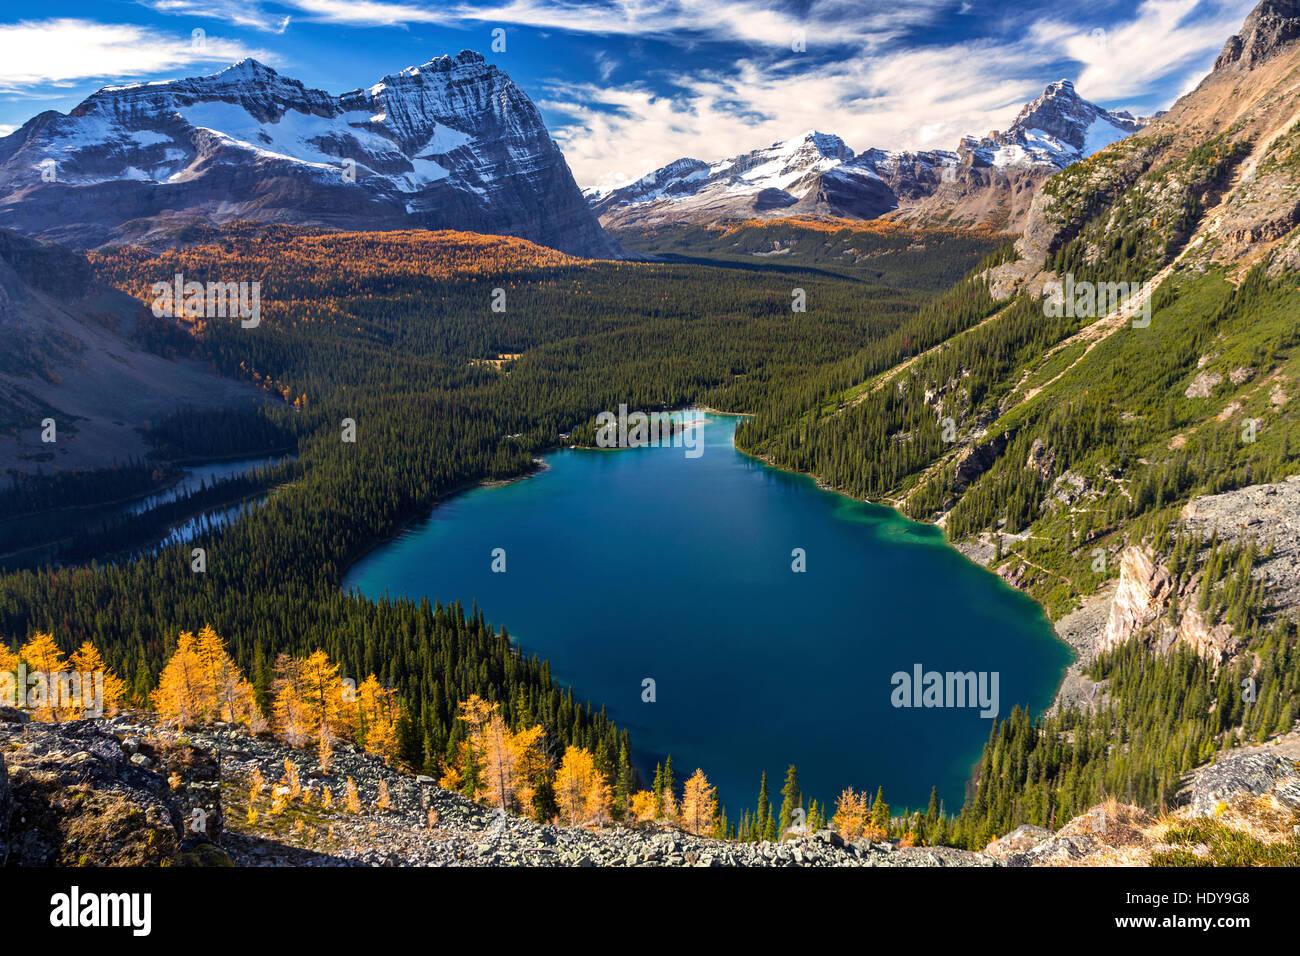 lake-ohara-basin-and-snowy-mountain-tops